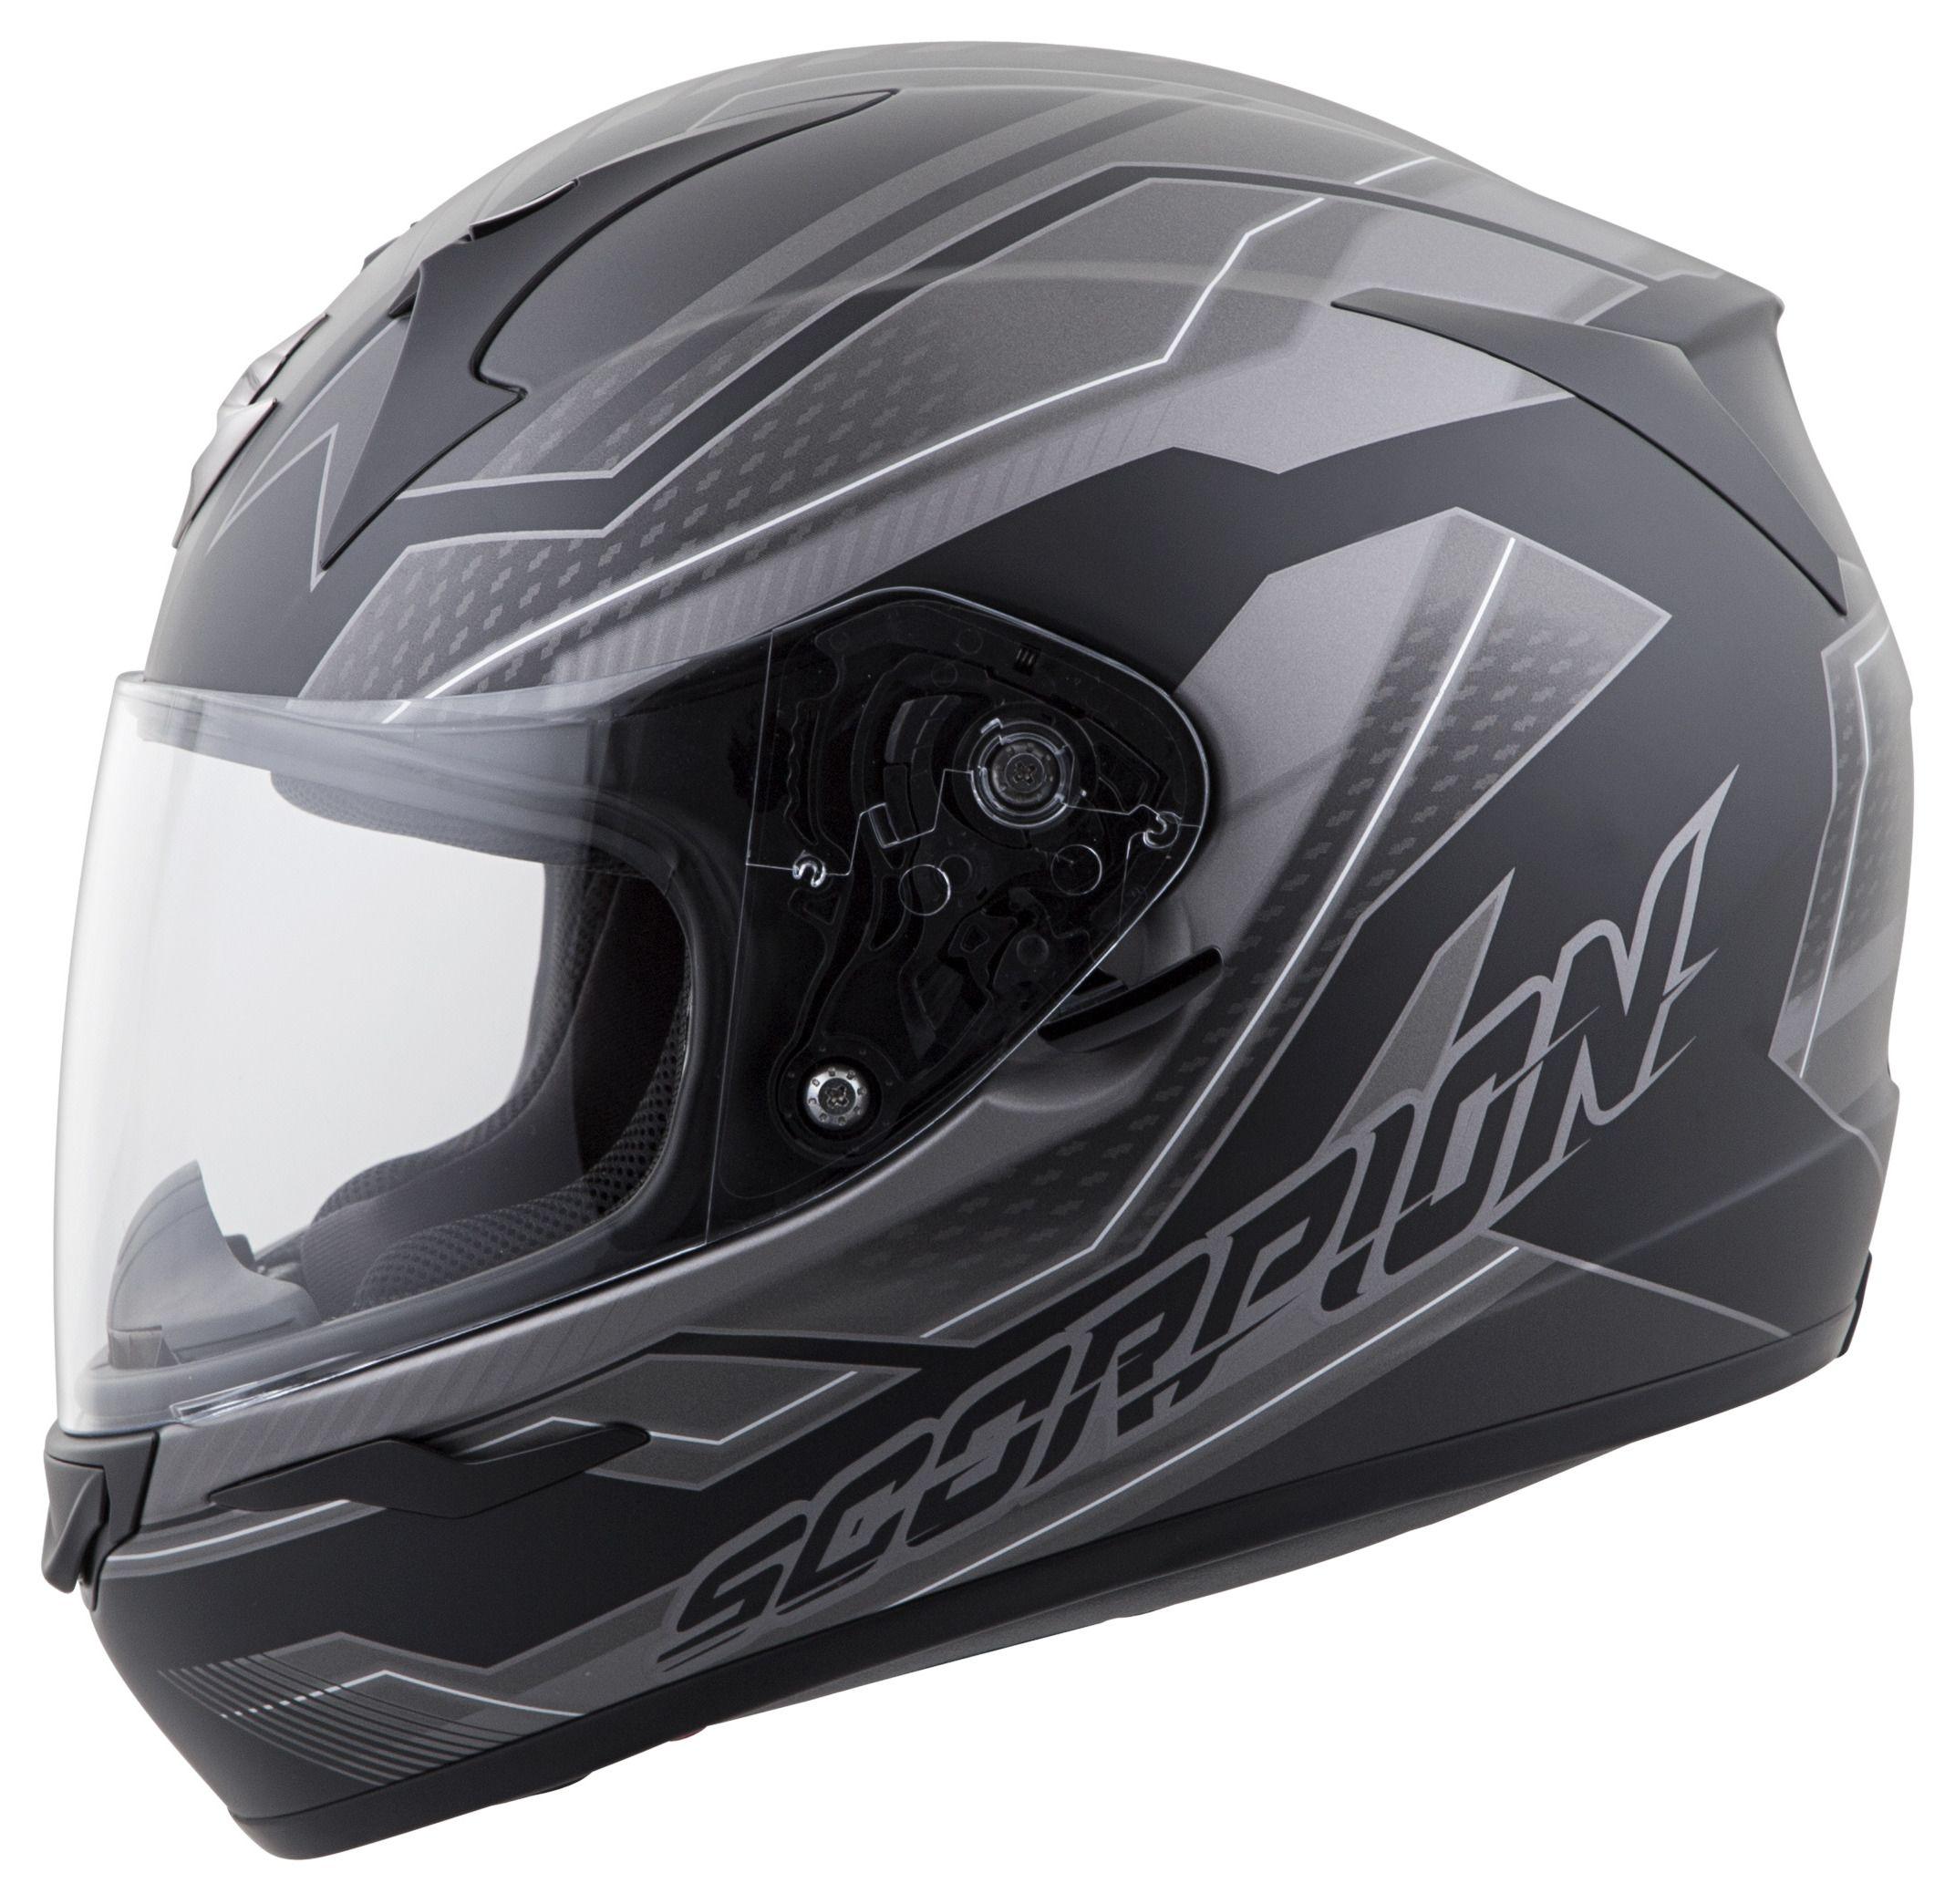 scorpion exo r410 airline helmet revzilla. Black Bedroom Furniture Sets. Home Design Ideas